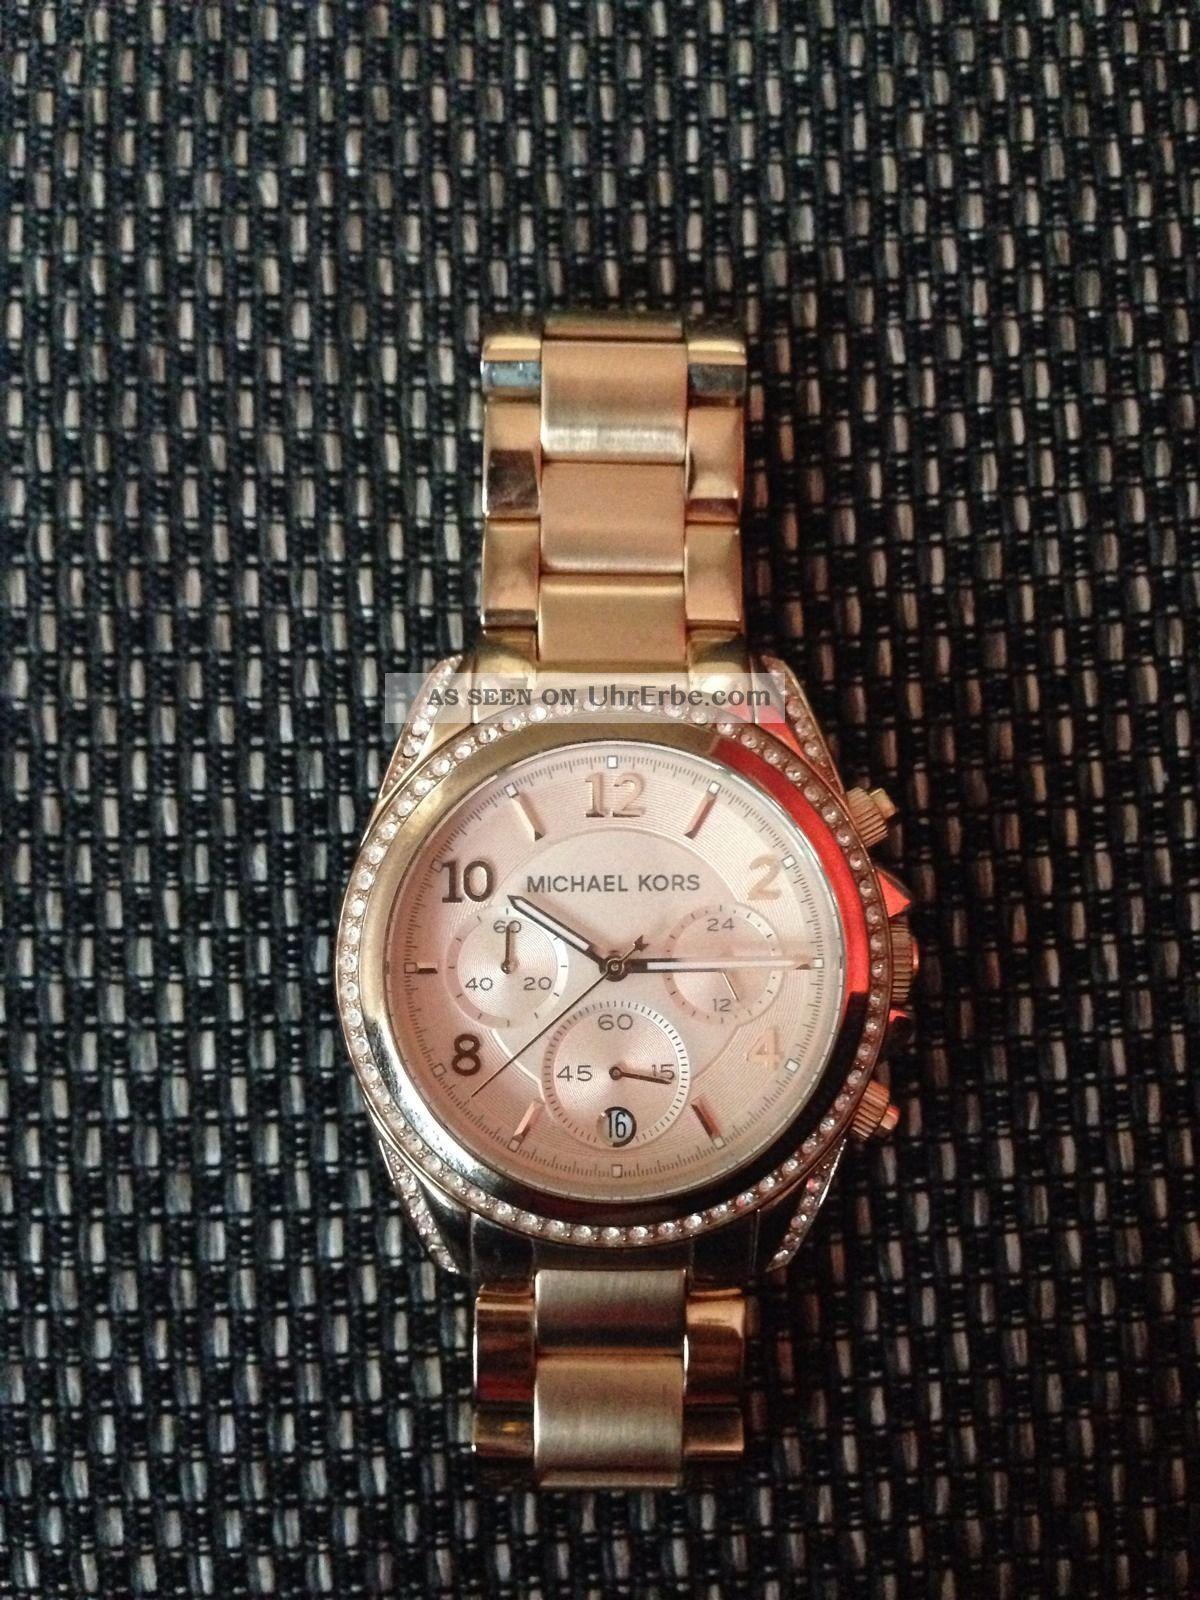 Michael Kors Damenuhr Armbanduhren Bild